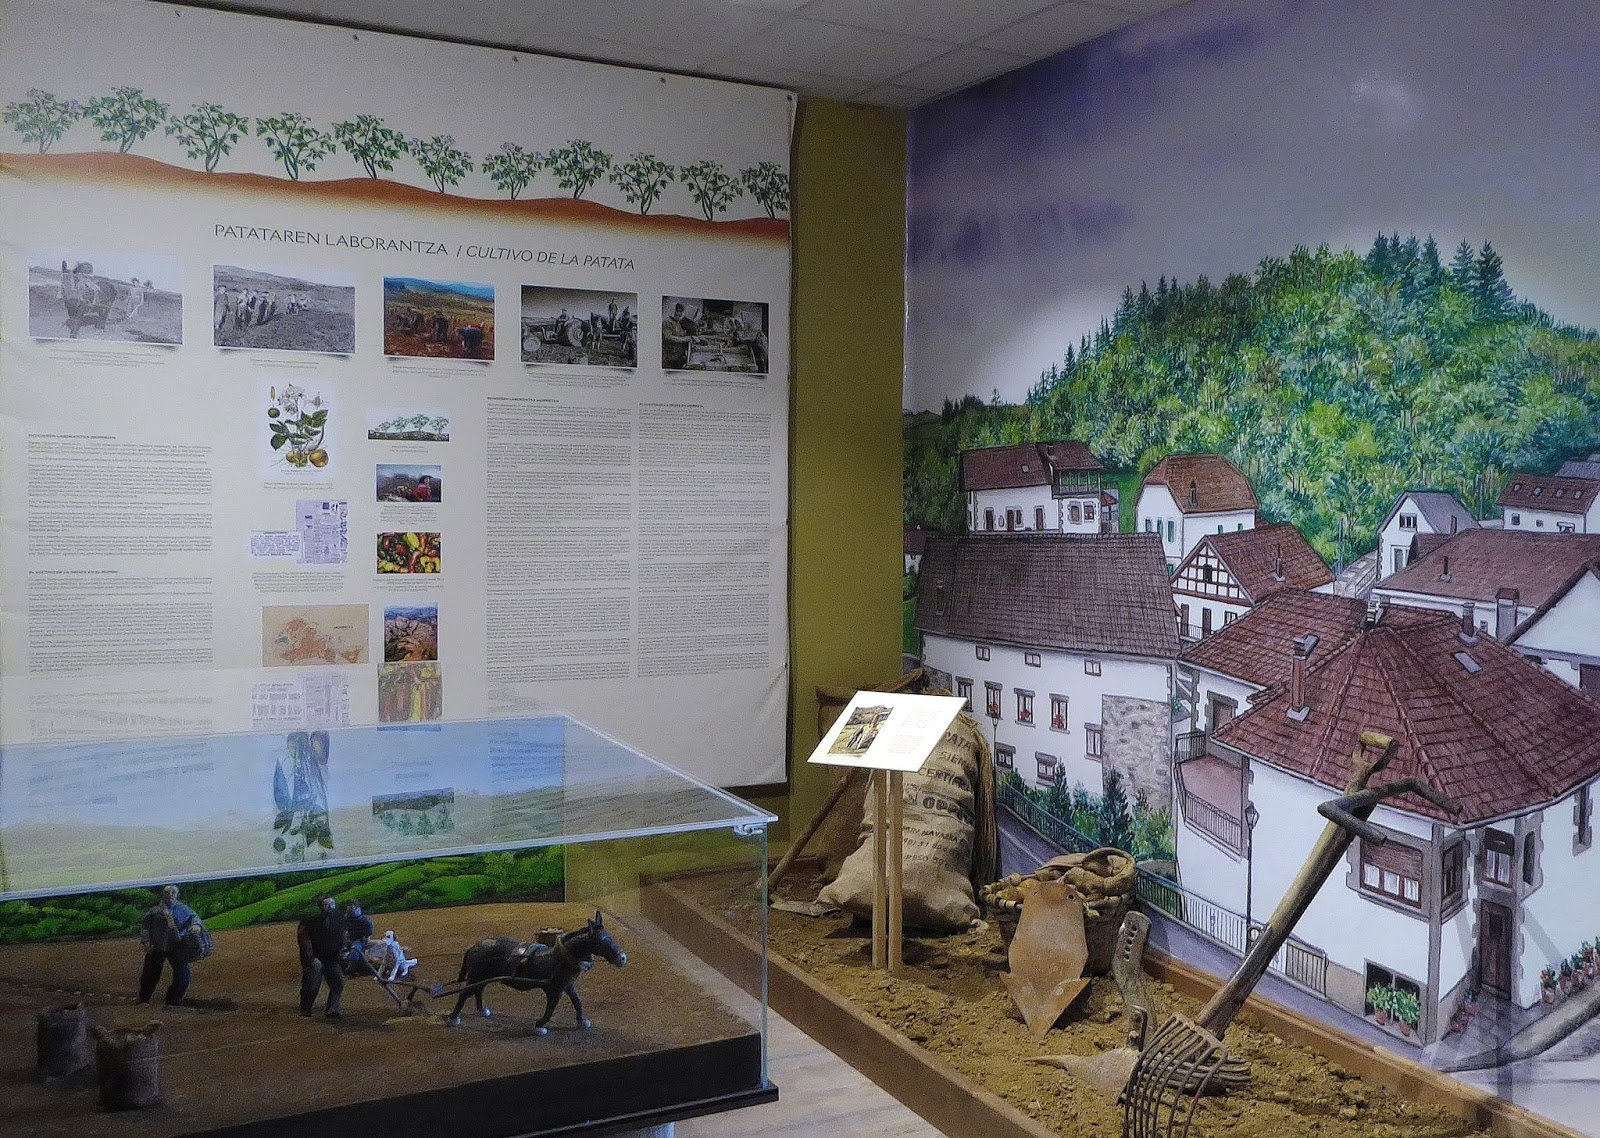 Museo etnográfico en Jaurrieta